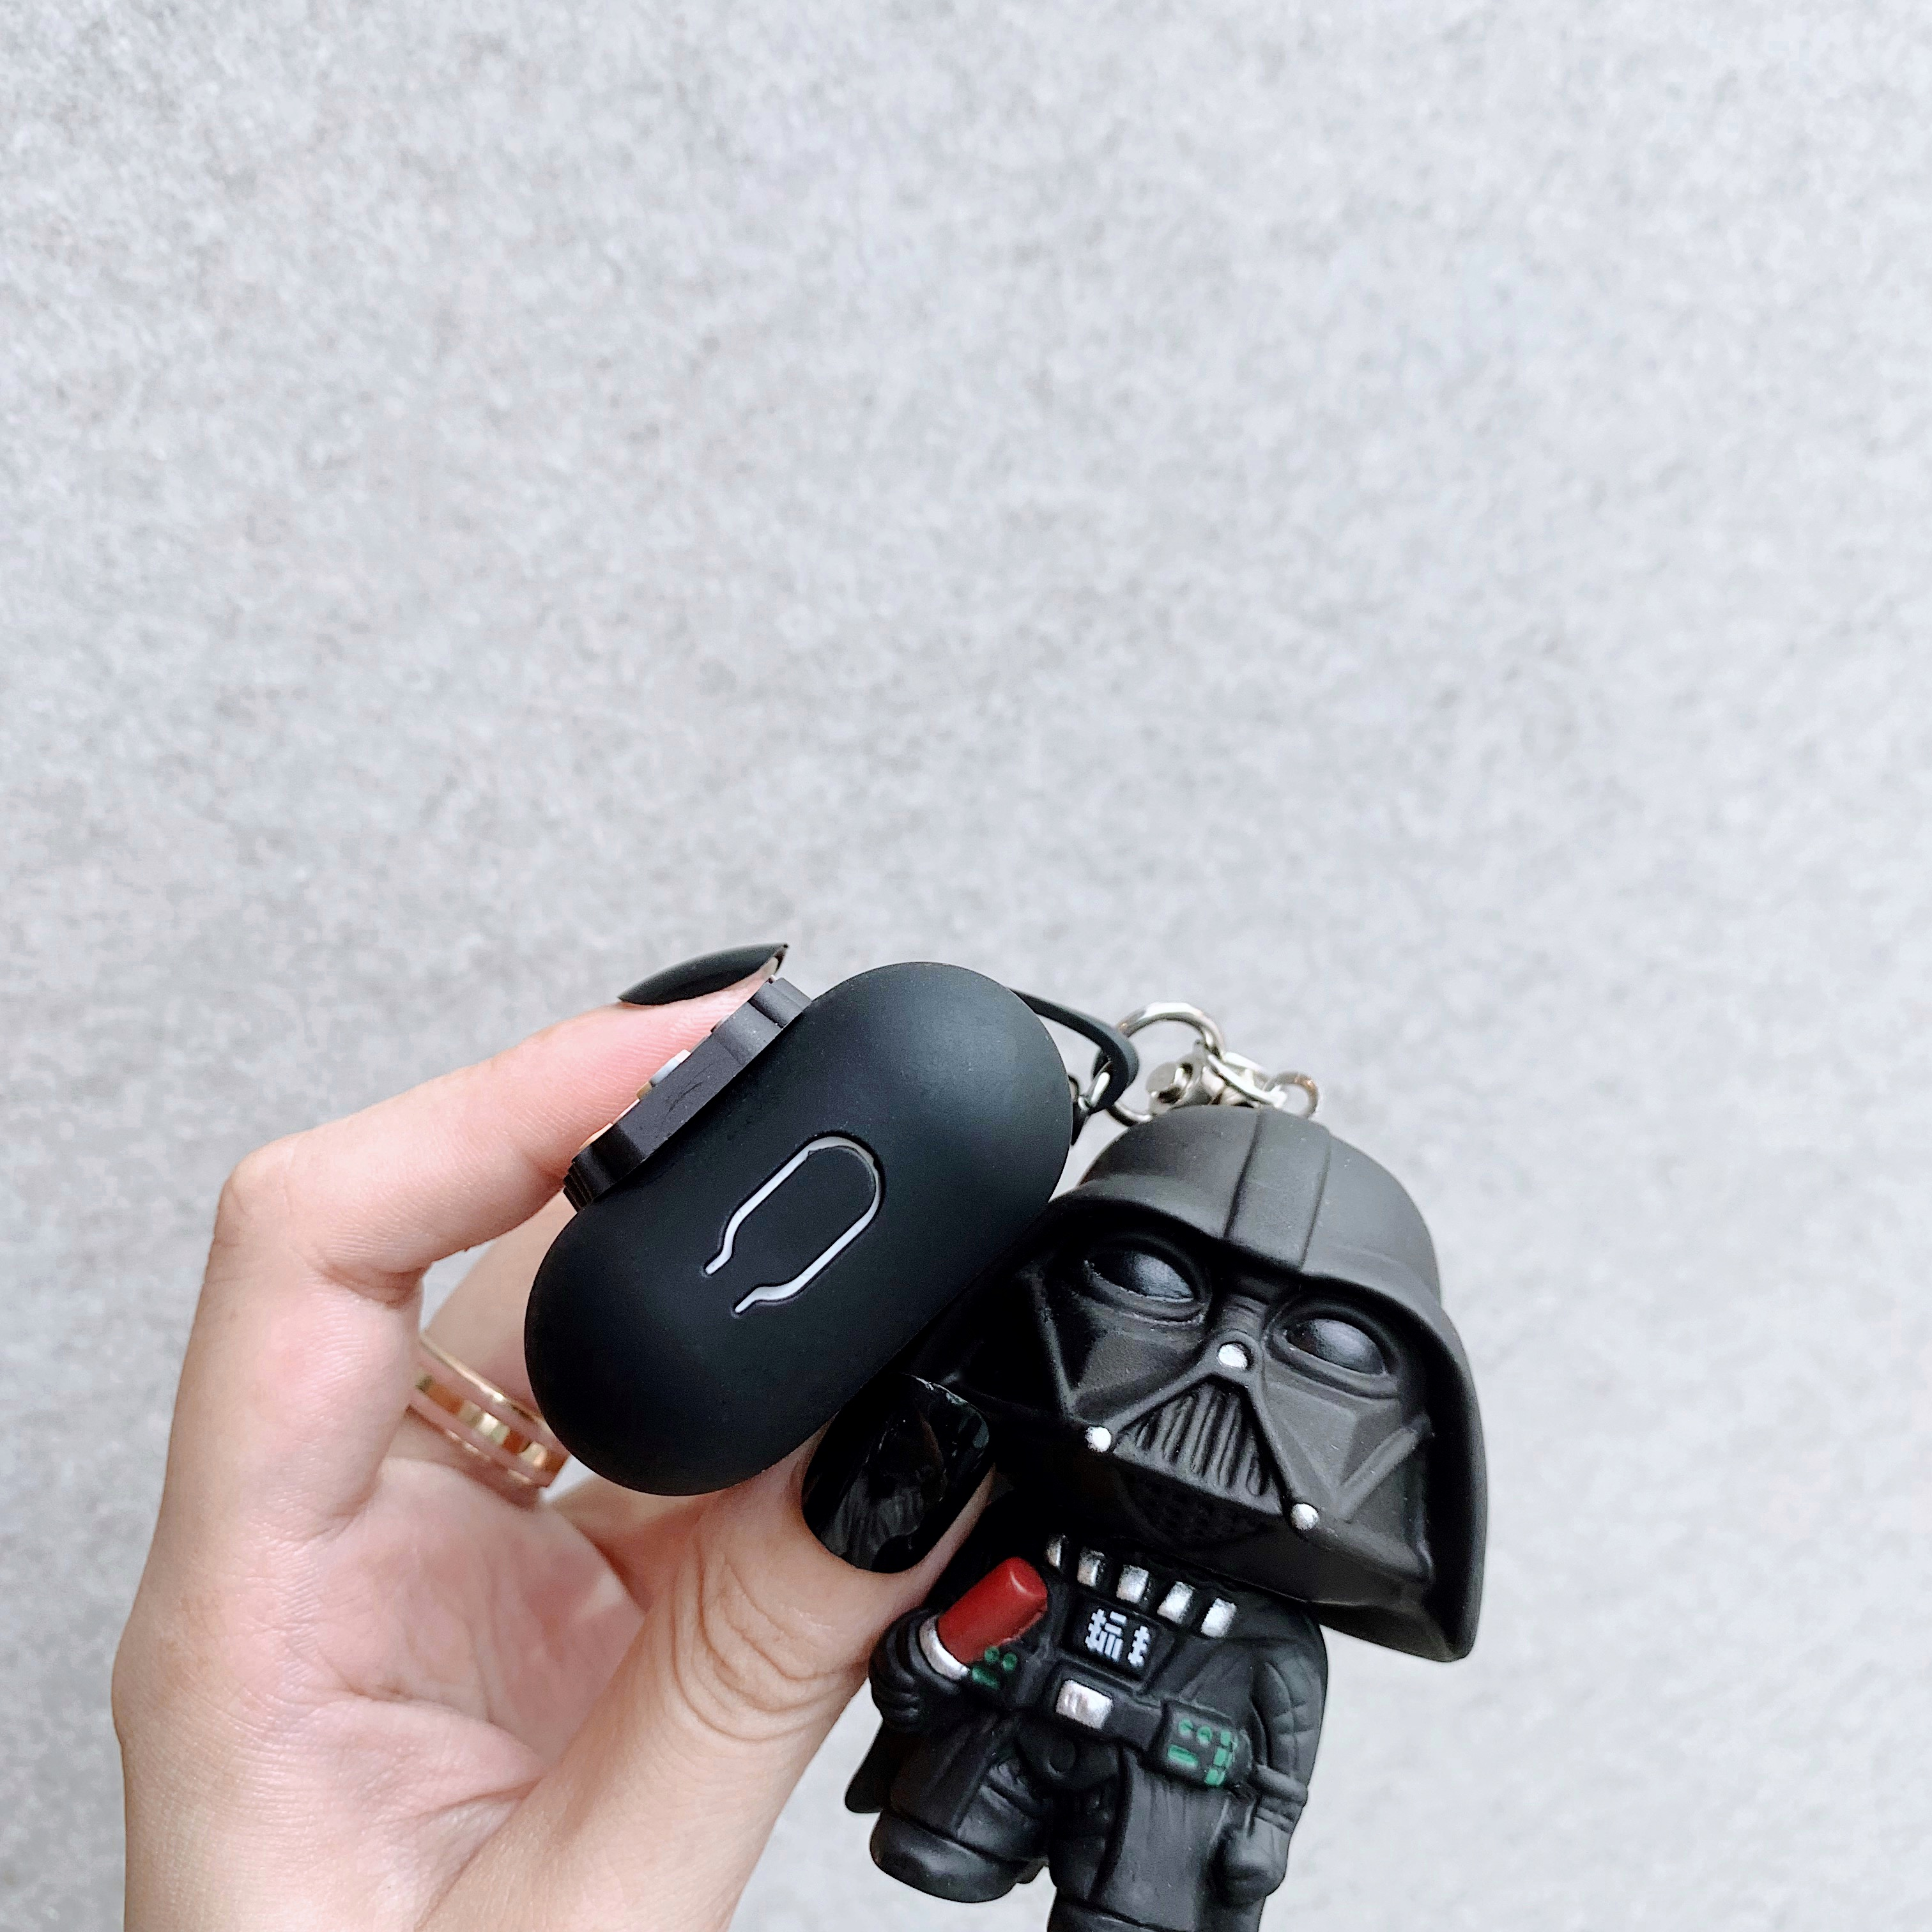 Star Wars AirPod Case 3